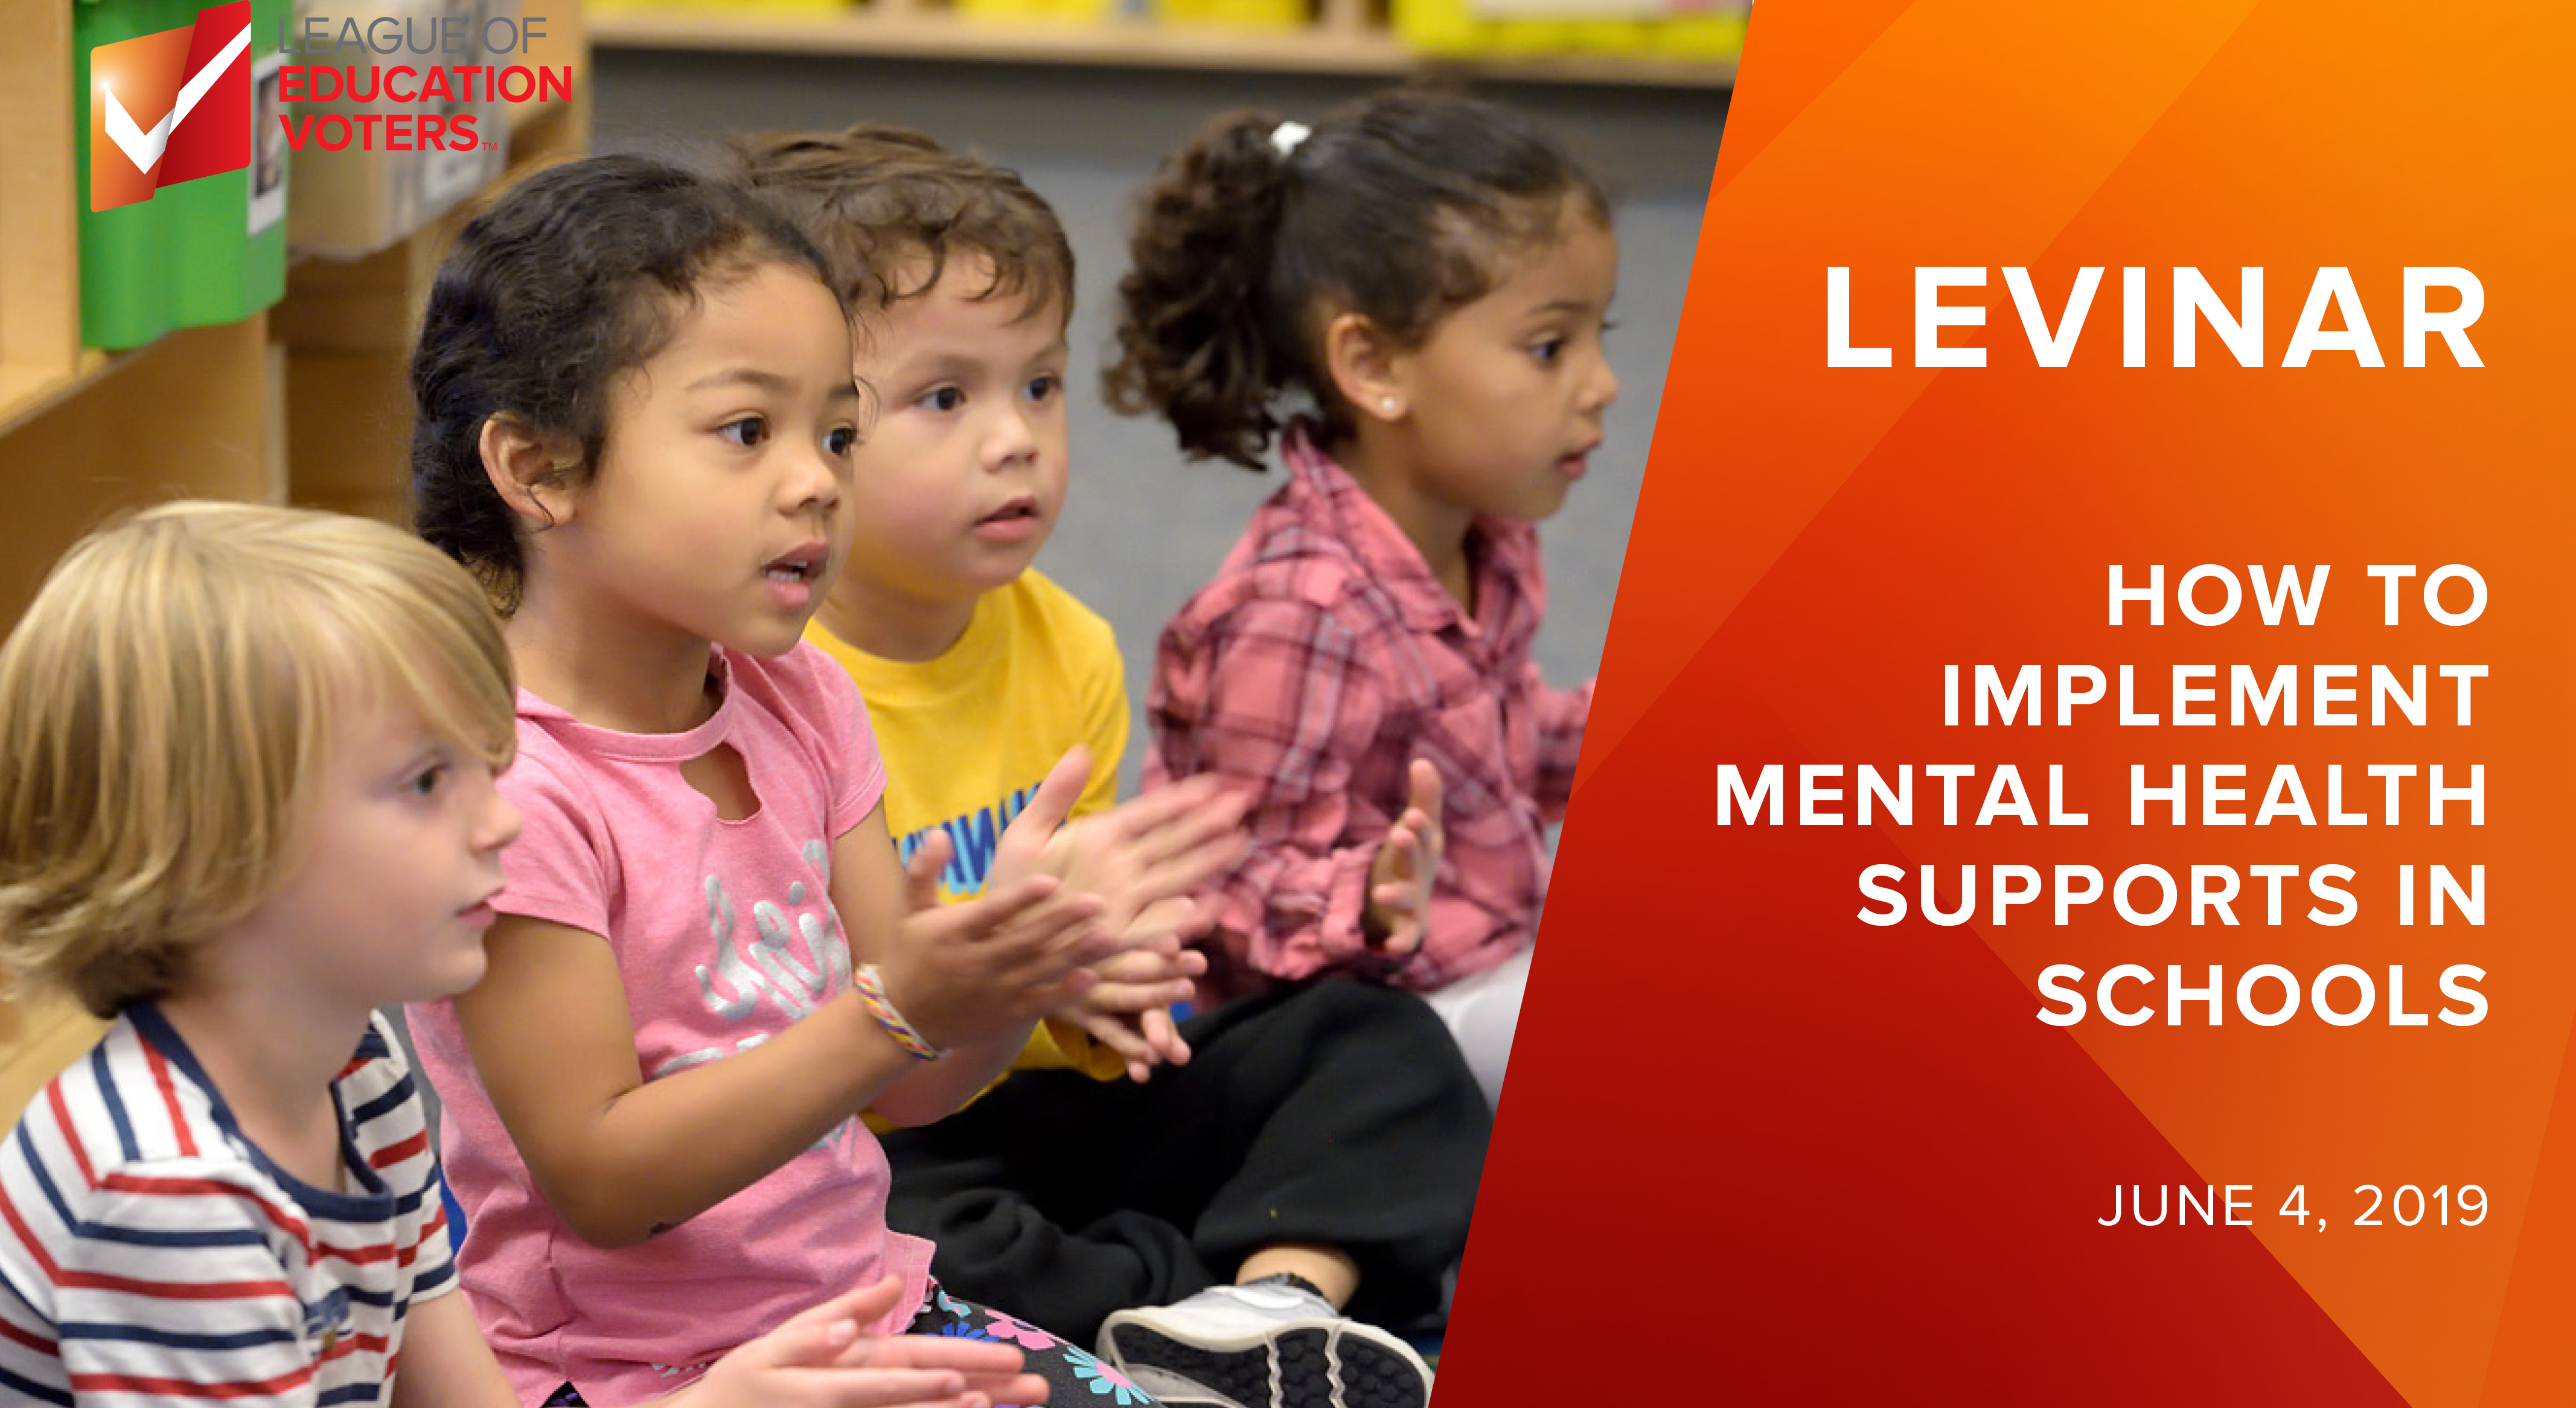 Educators Speak Out On Underfunding Of >> Previous Levinars League Of Education Voters